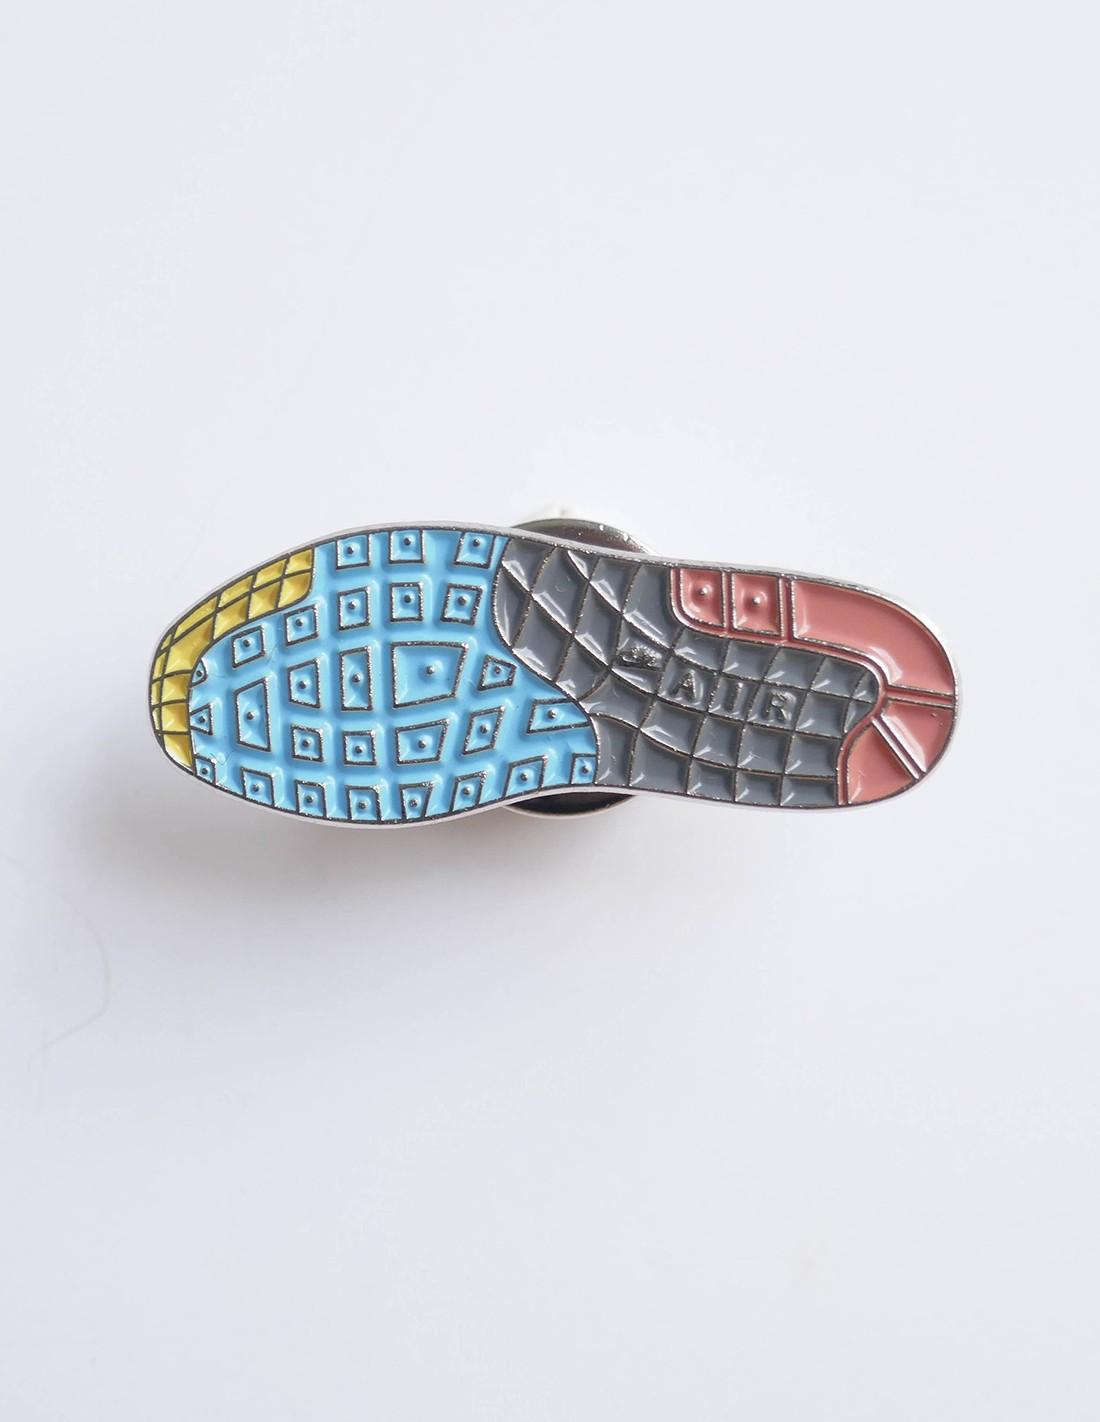 official photos 54cef 3d9bf Pins Outsole Nike air max 1/97 SW| Fskorp Ltd